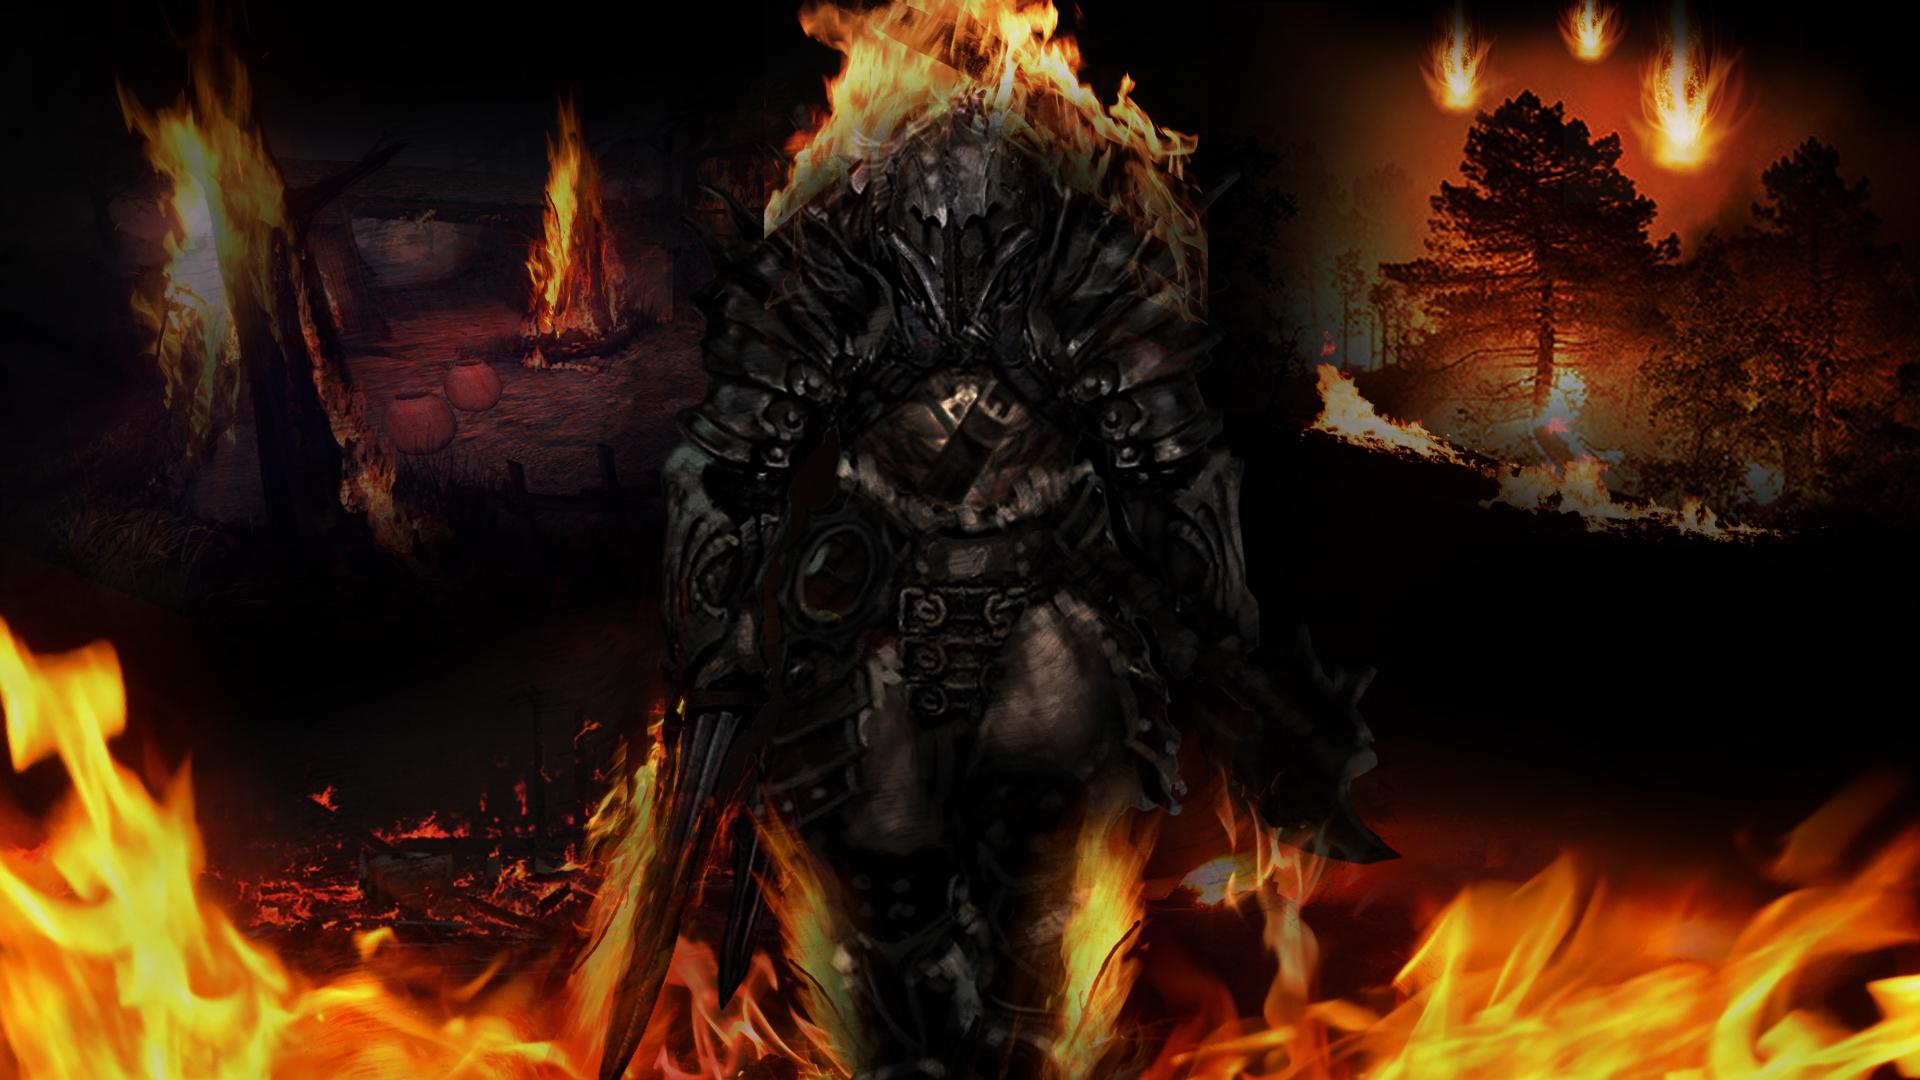 Diablo 3 Barbarian Fire Wallpaper by CHIPINATORs 1920x1080